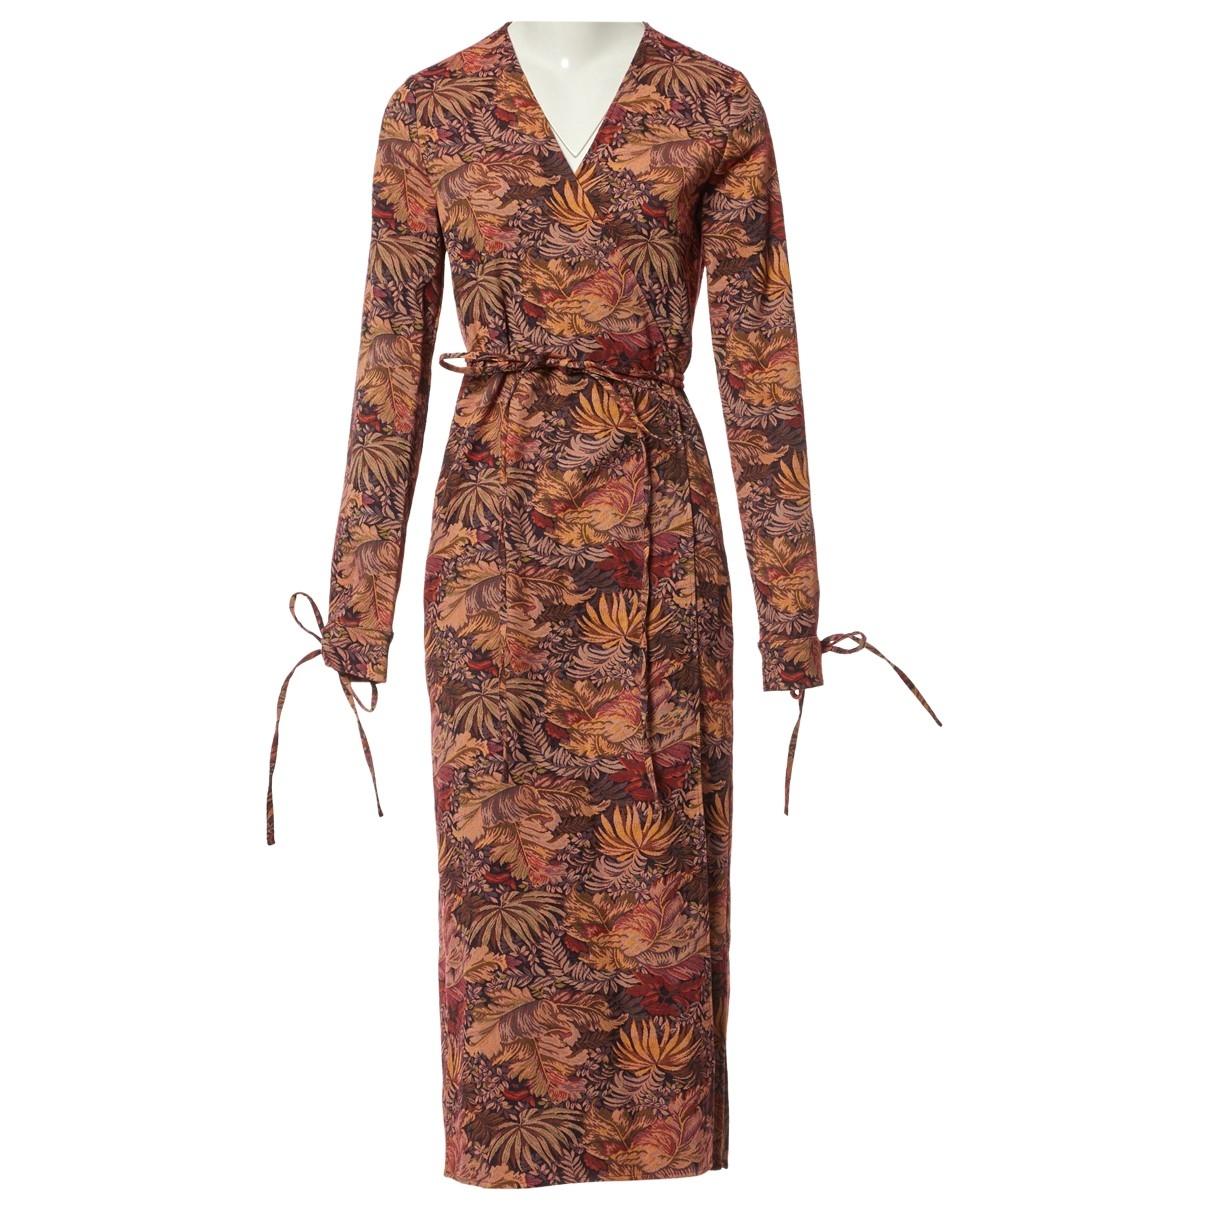 Attico \N Kleid in  Bunt Polyester